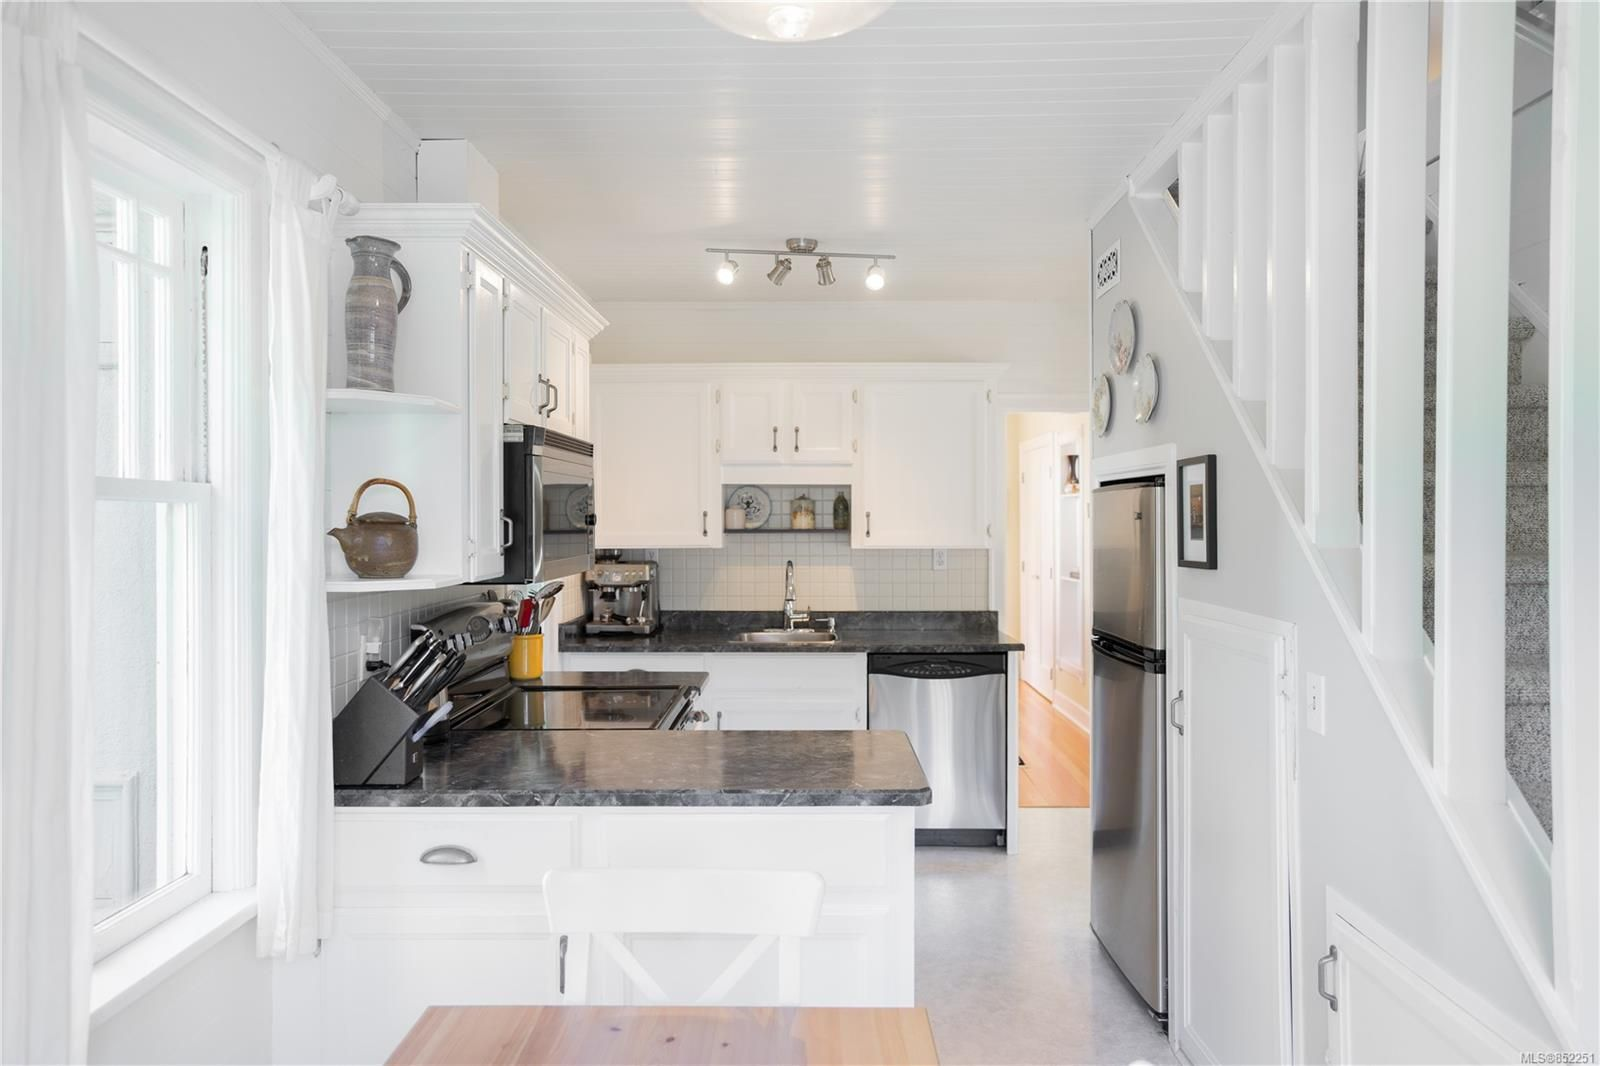 Photo 3: Photos: 2363 Pacific Ave in : OB Estevan House for sale (Oak Bay)  : MLS®# 852251